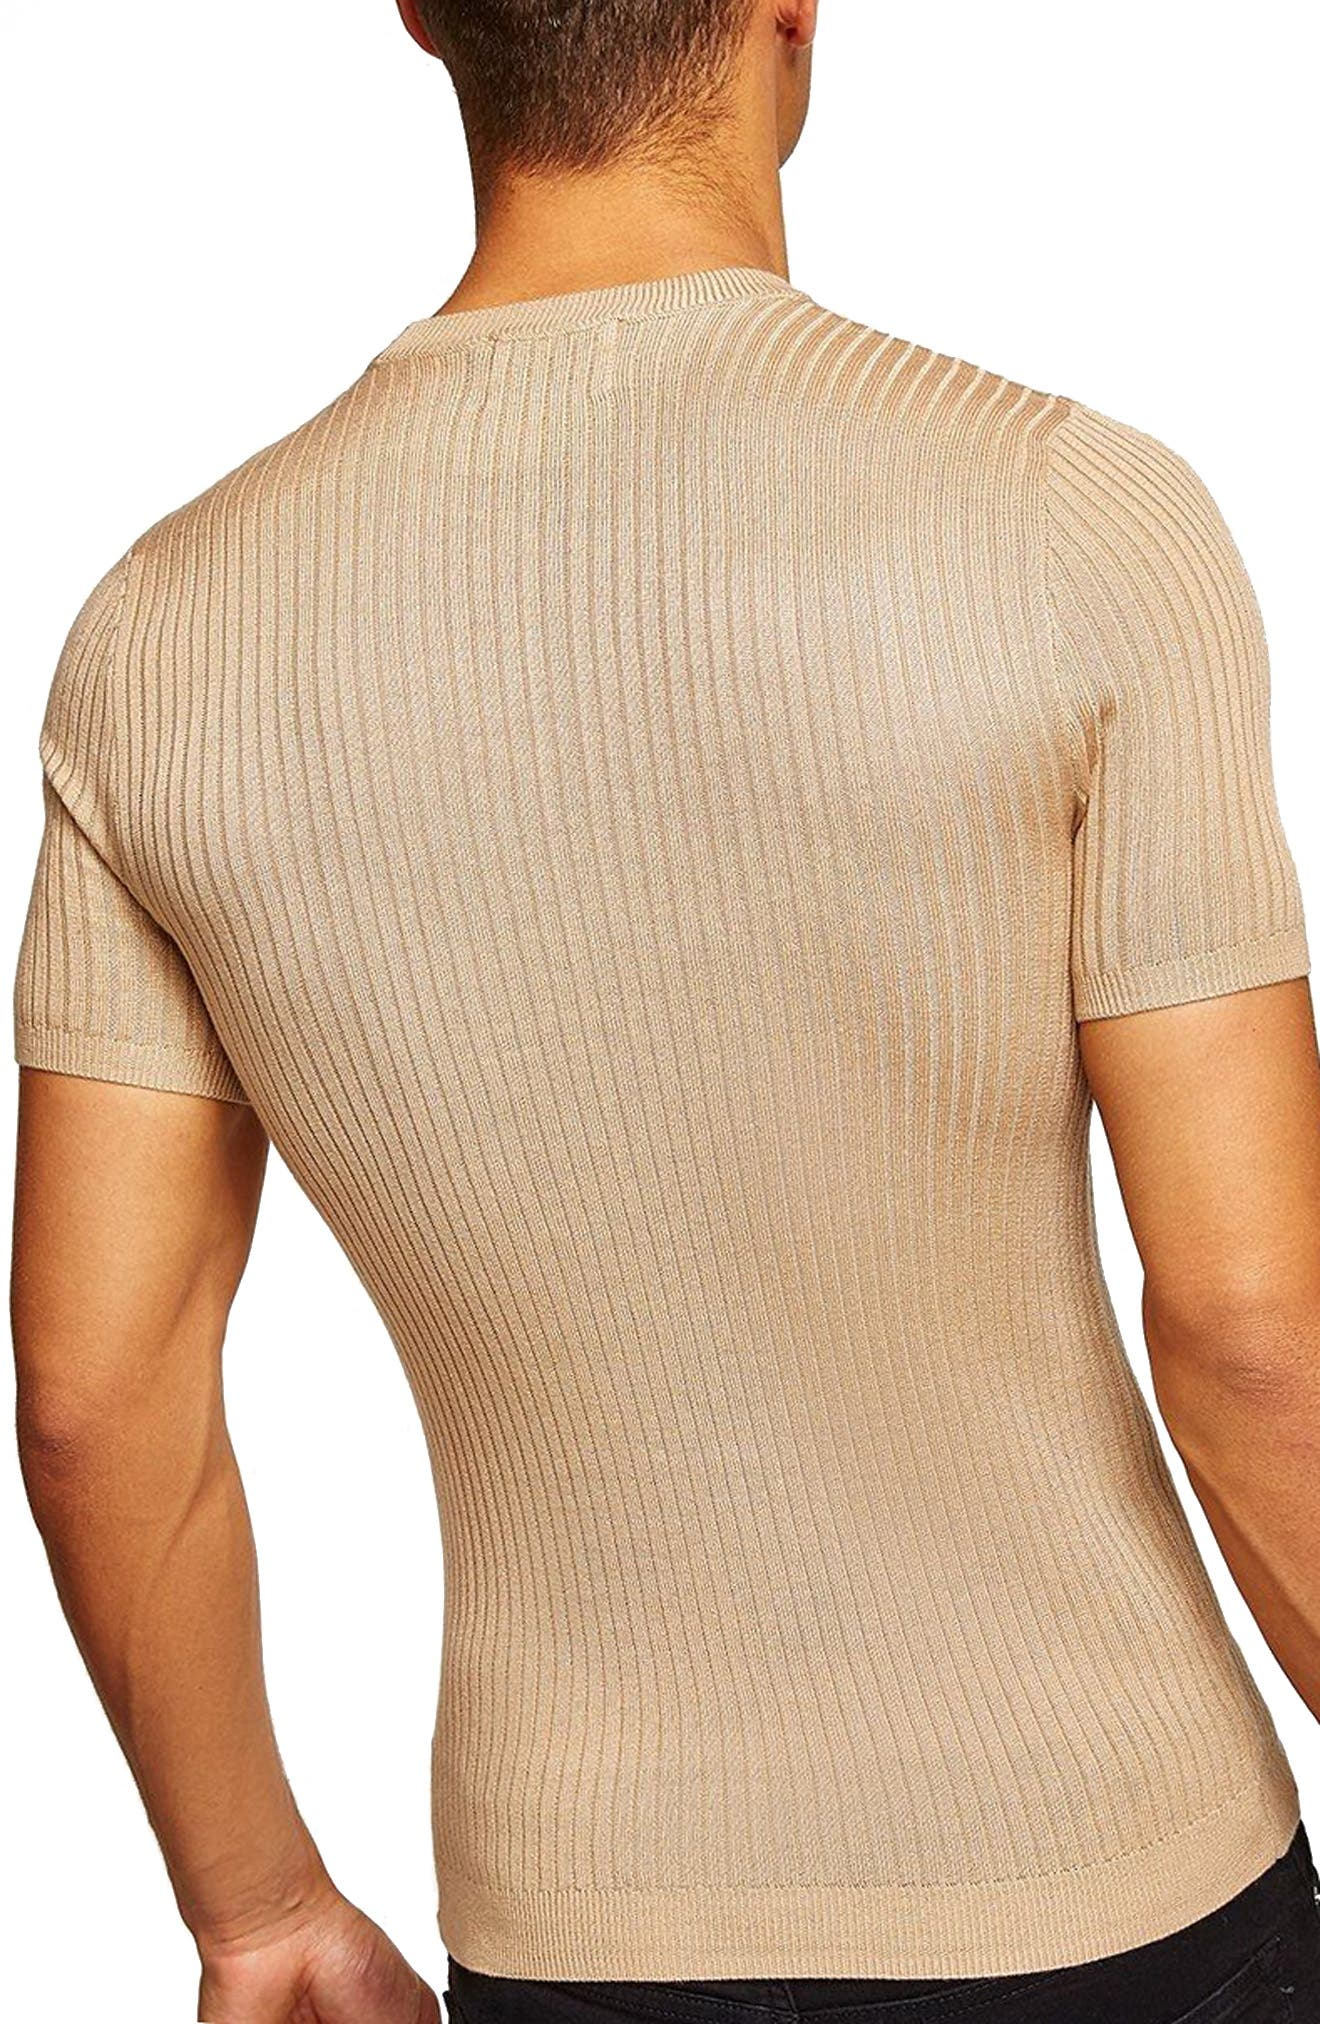 TOPMAN,                             Short Sleeve Muscle Fit Shirt,                             Alternate thumbnail 2, color,                             250